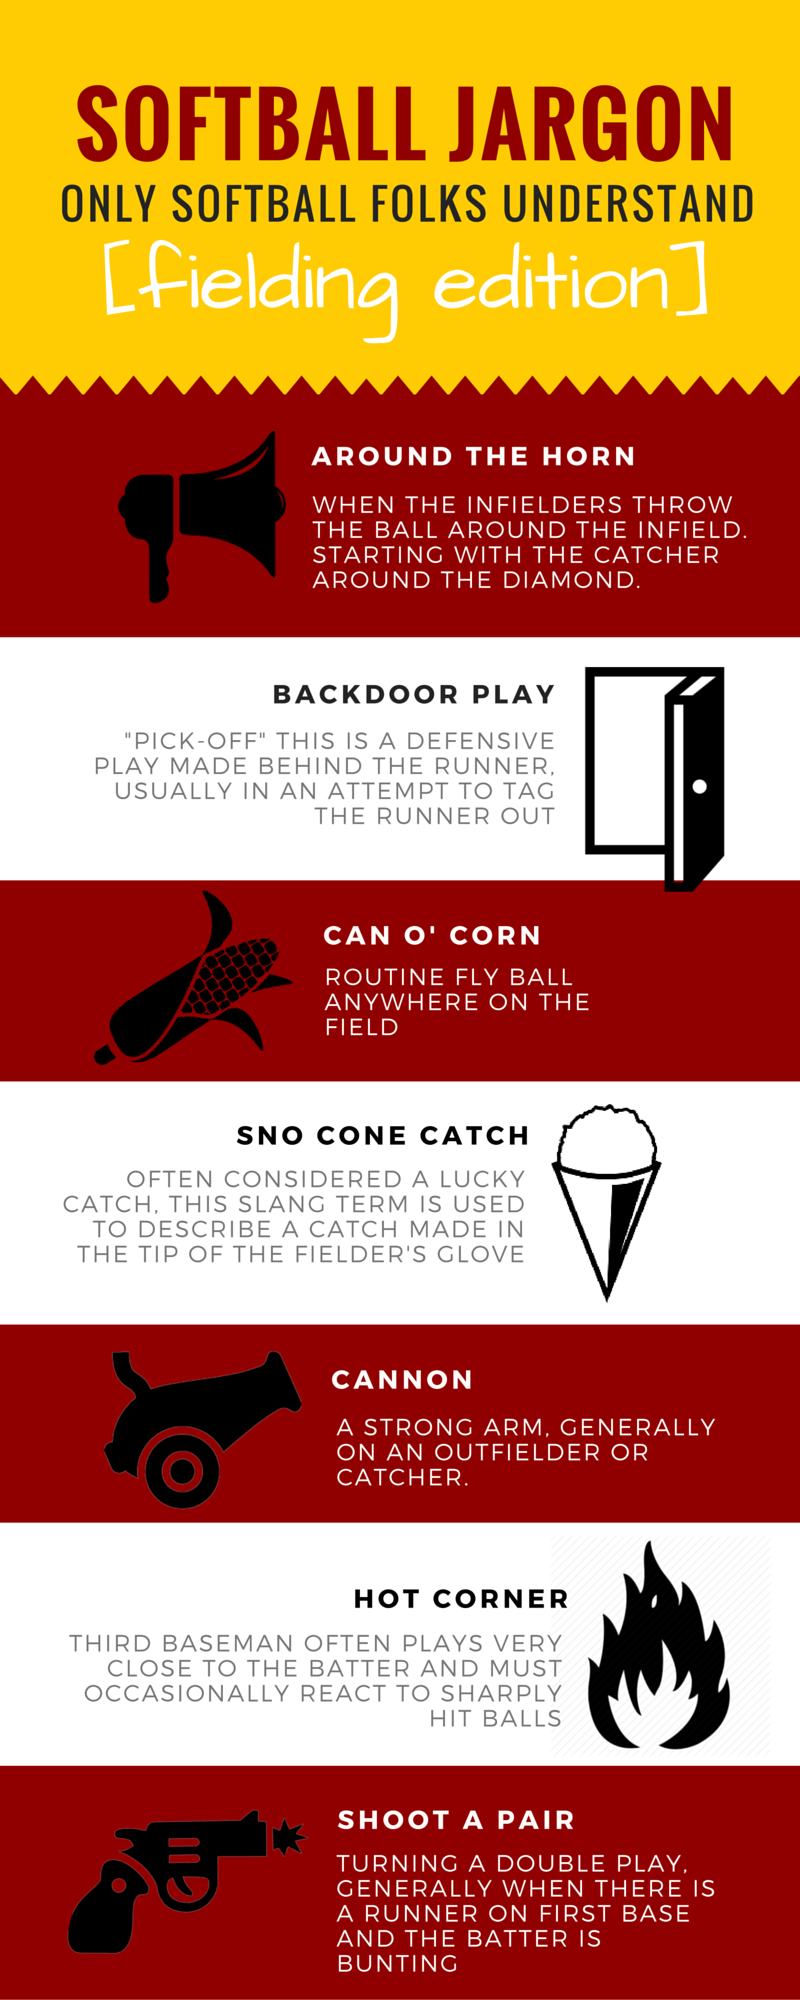 Softball_Jargon_Fielding_Edition.png